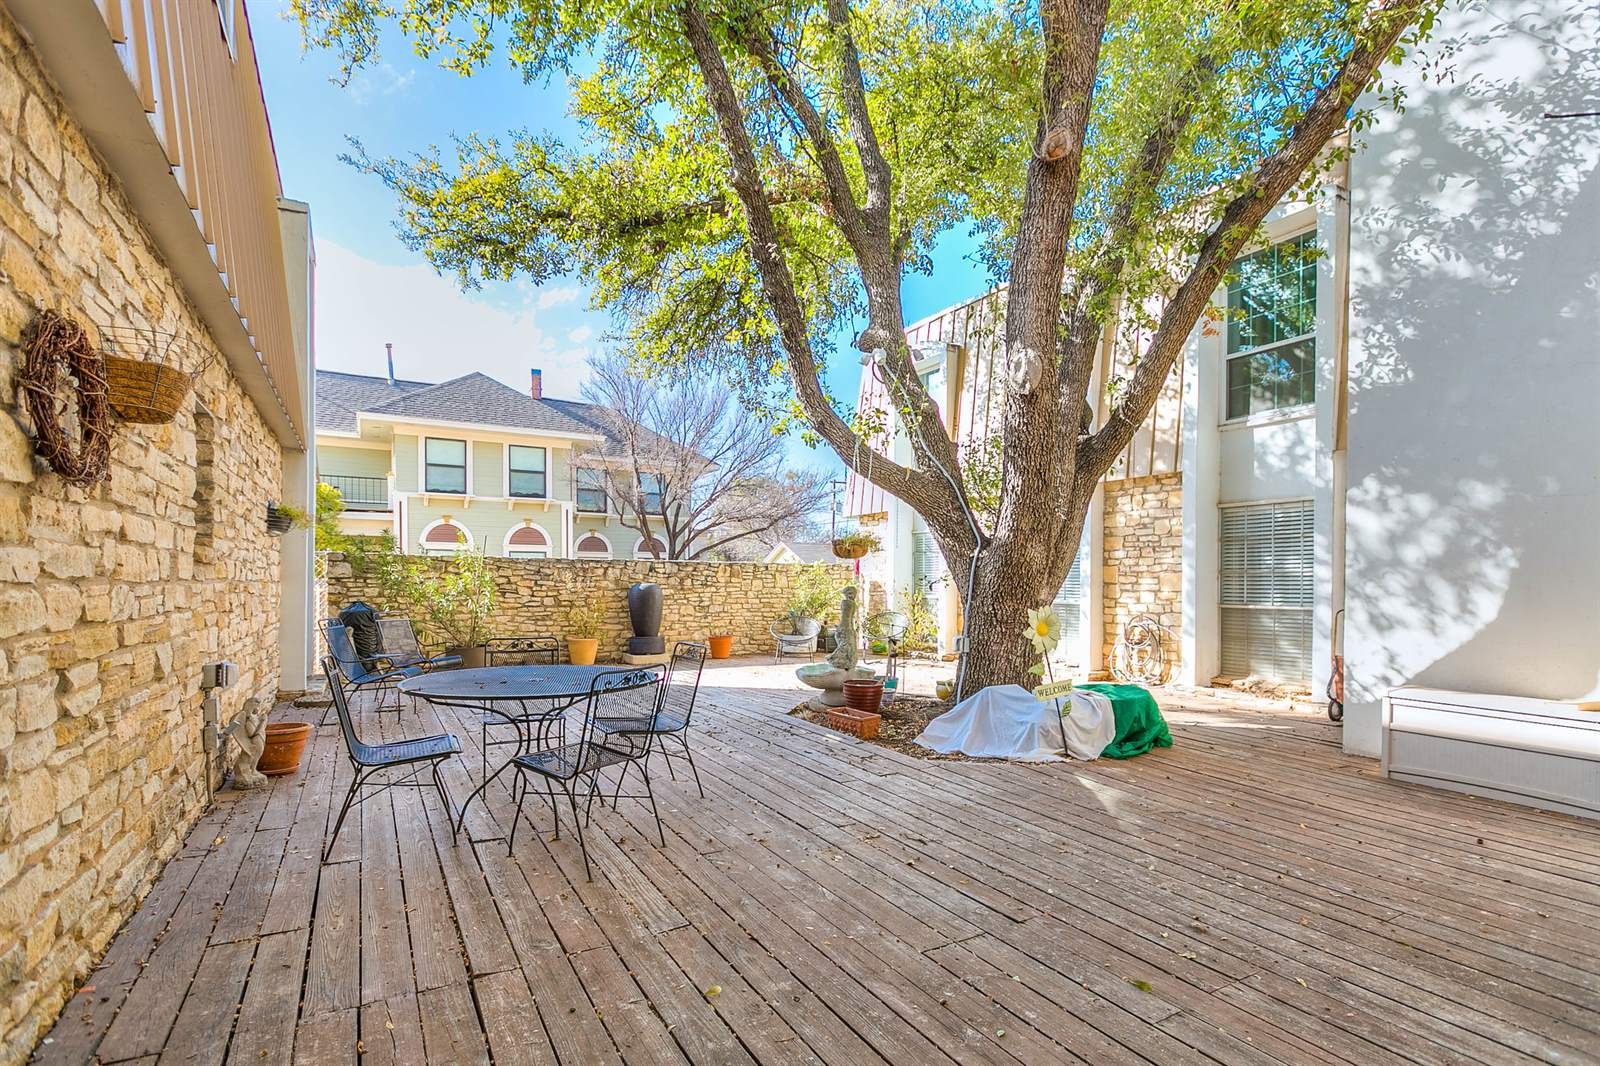 326-1A W Concho Ave, San Angelo, TX 76903